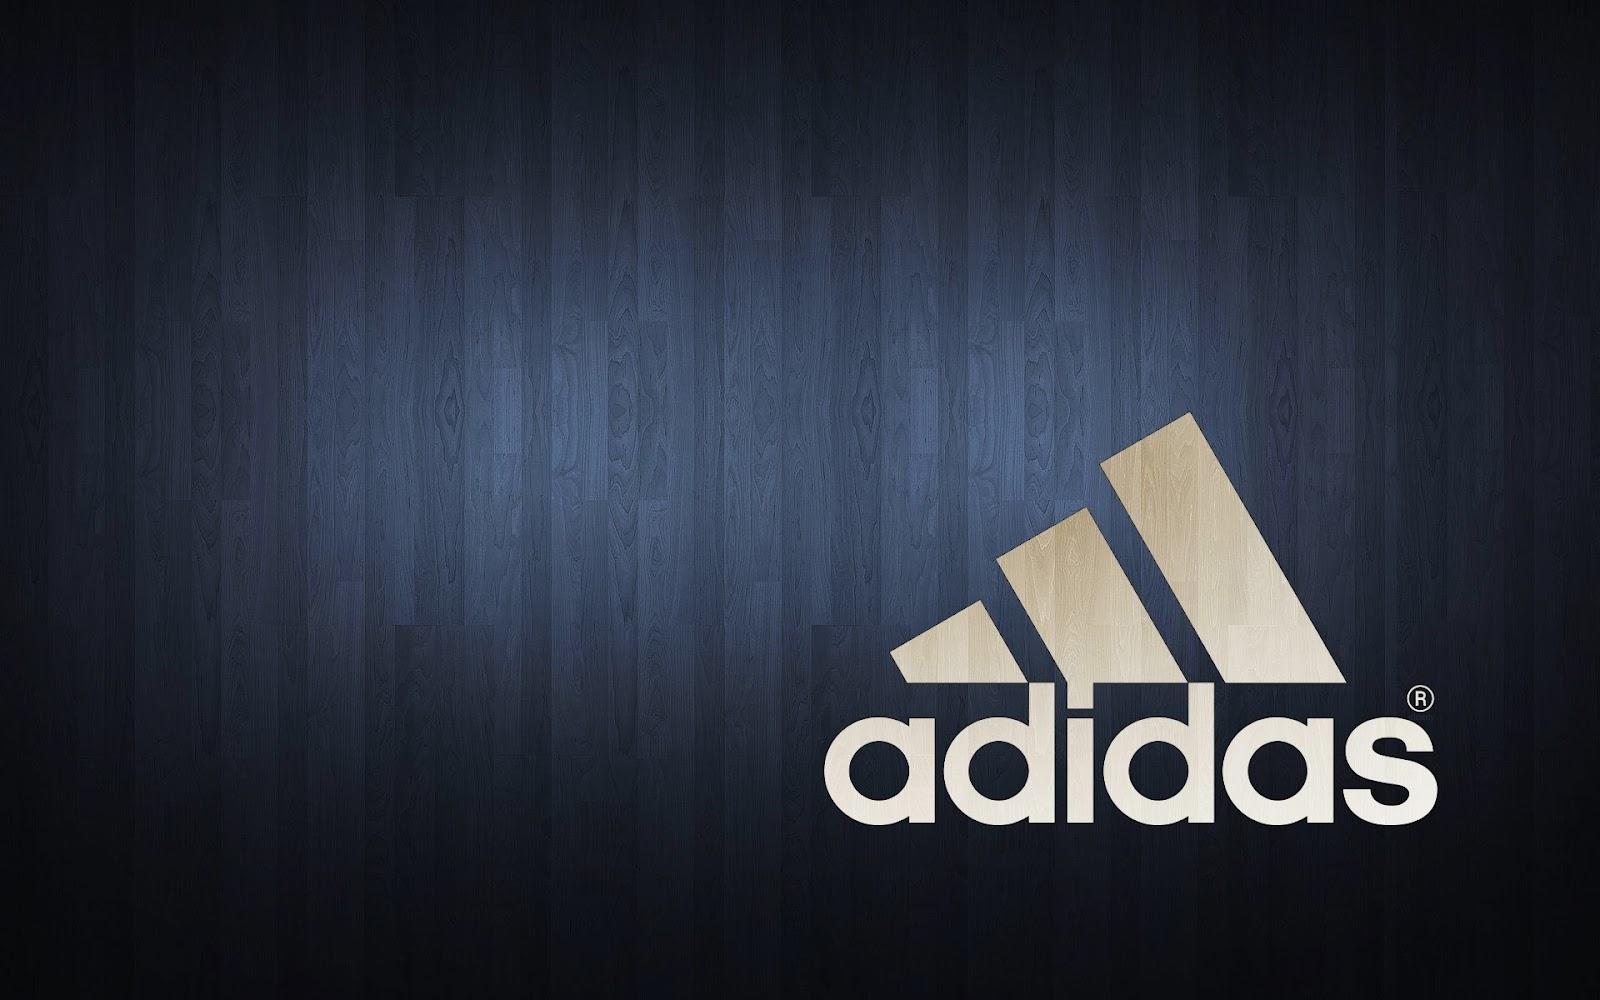 Logo Adidas Wallpaper Picture Wallpaper WallpaperLepi 1600x1000